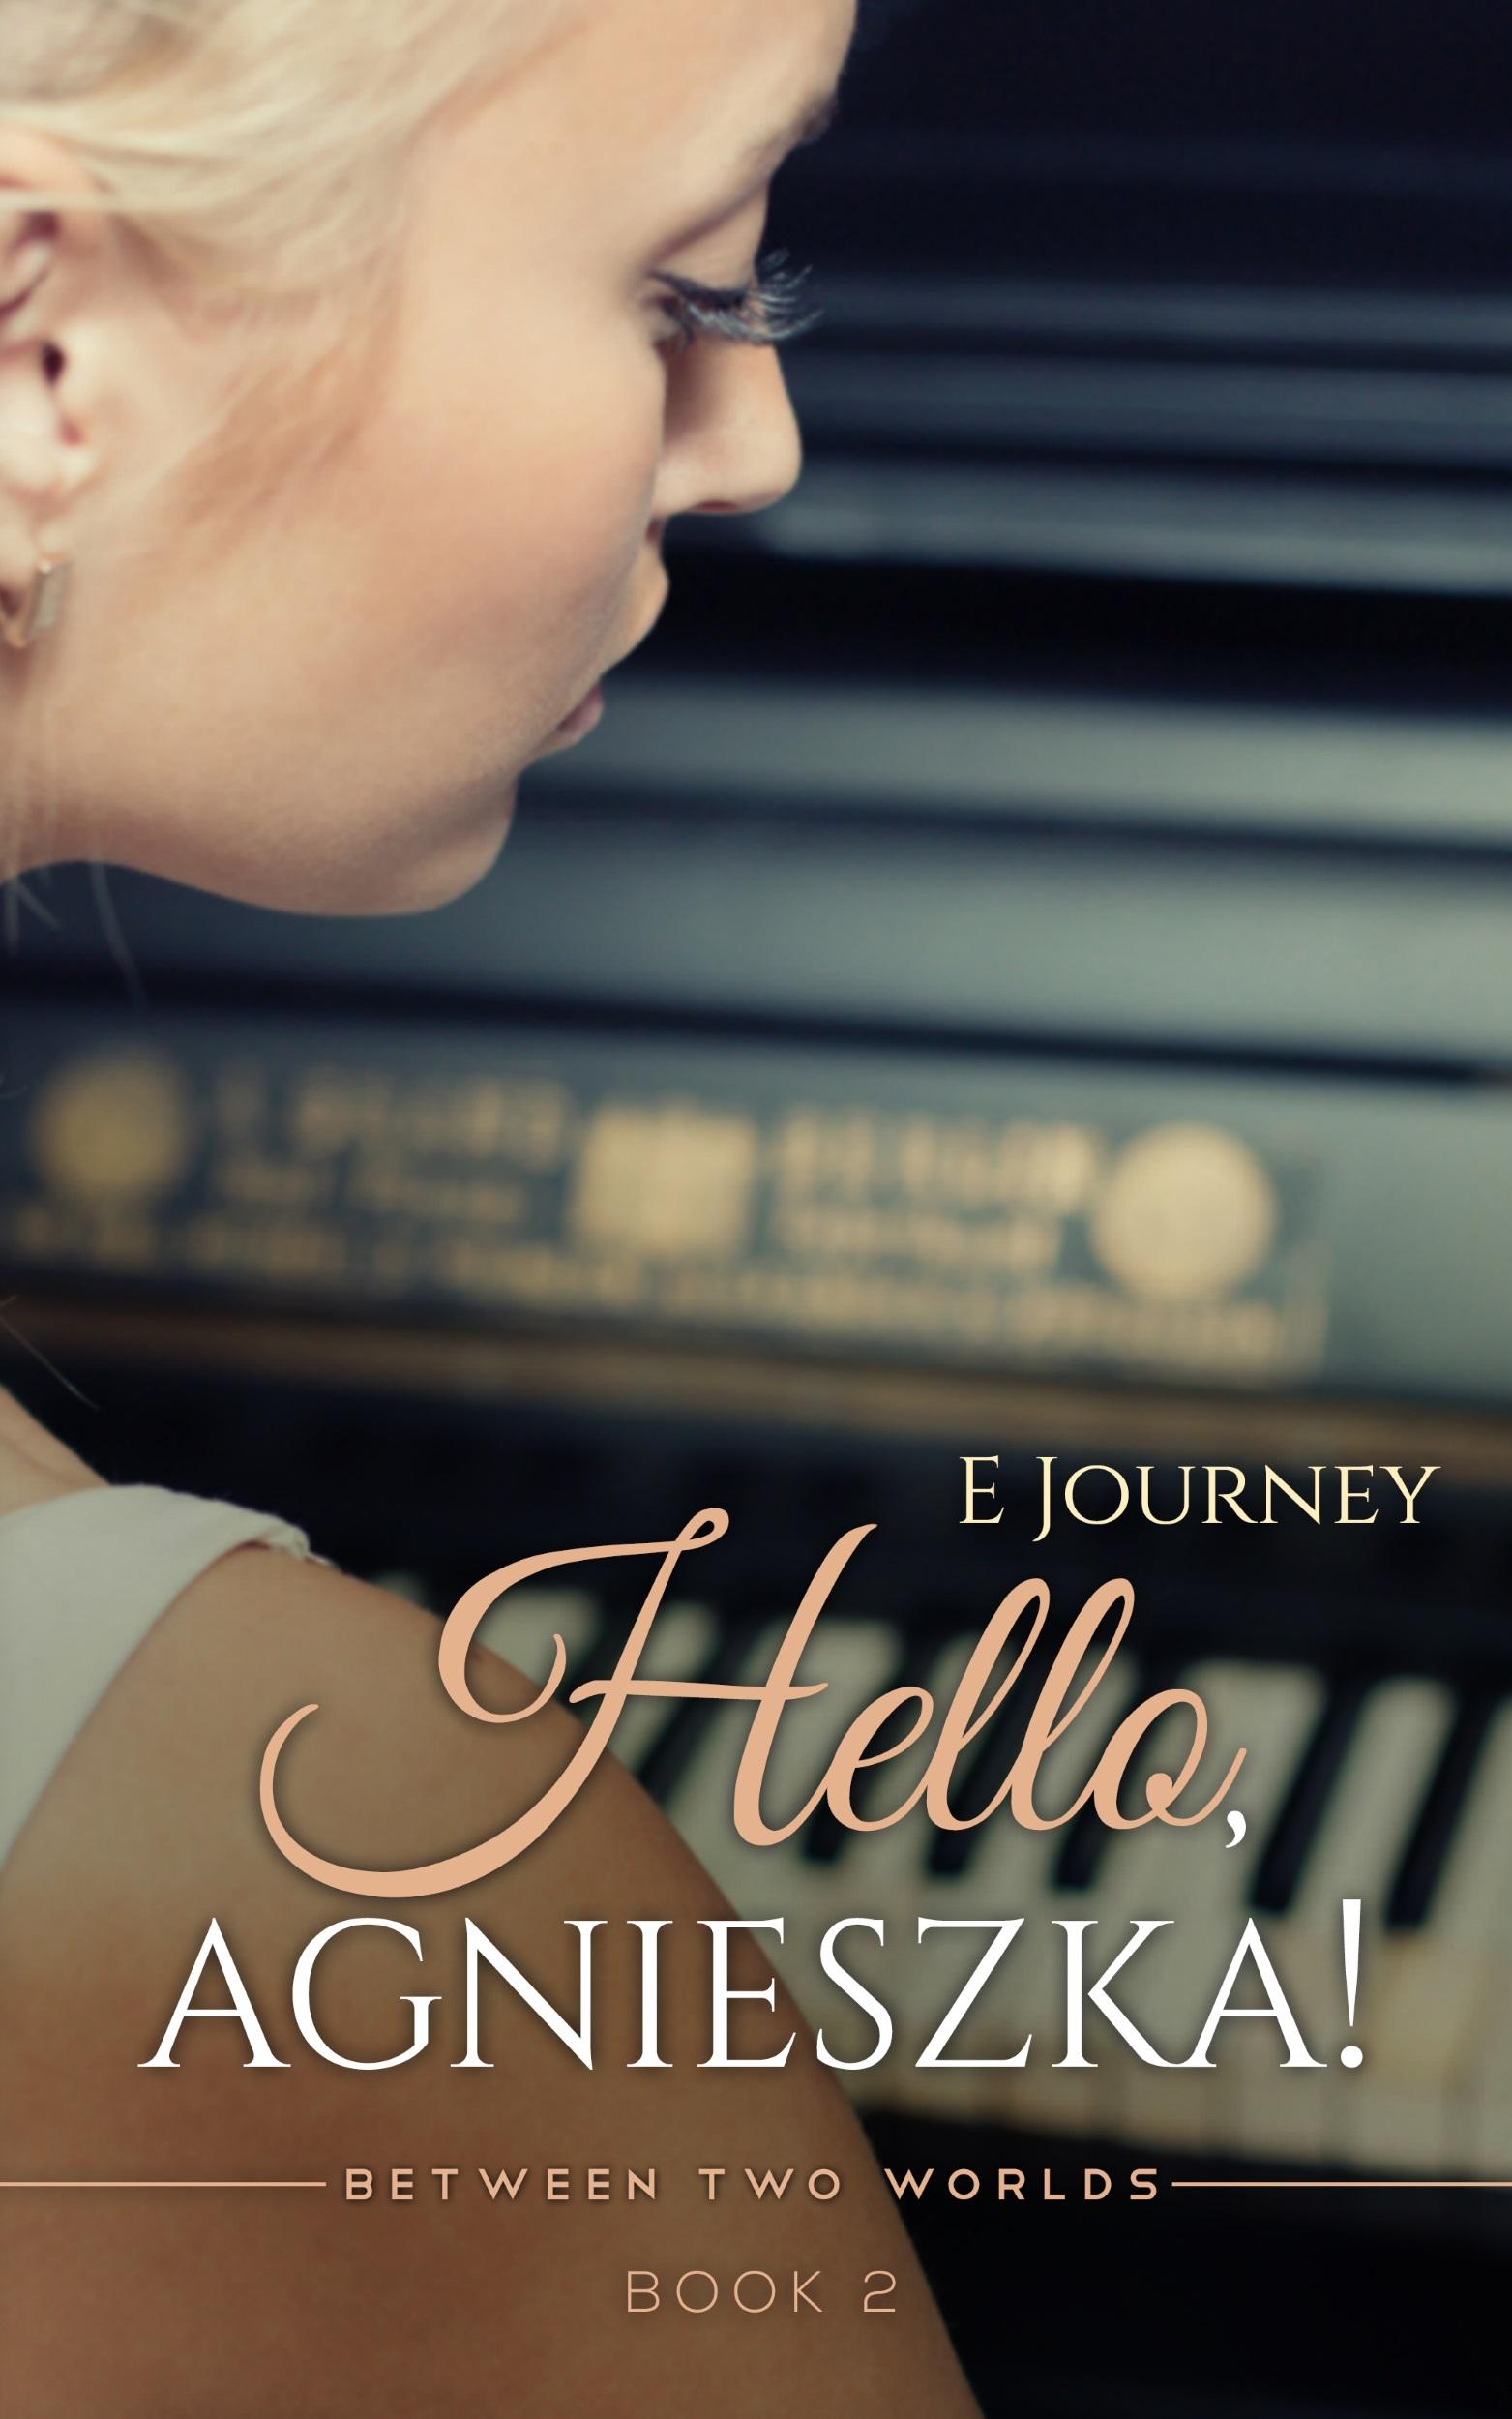 Hello, Agnieszka! (Between Two Worlds Book 2)